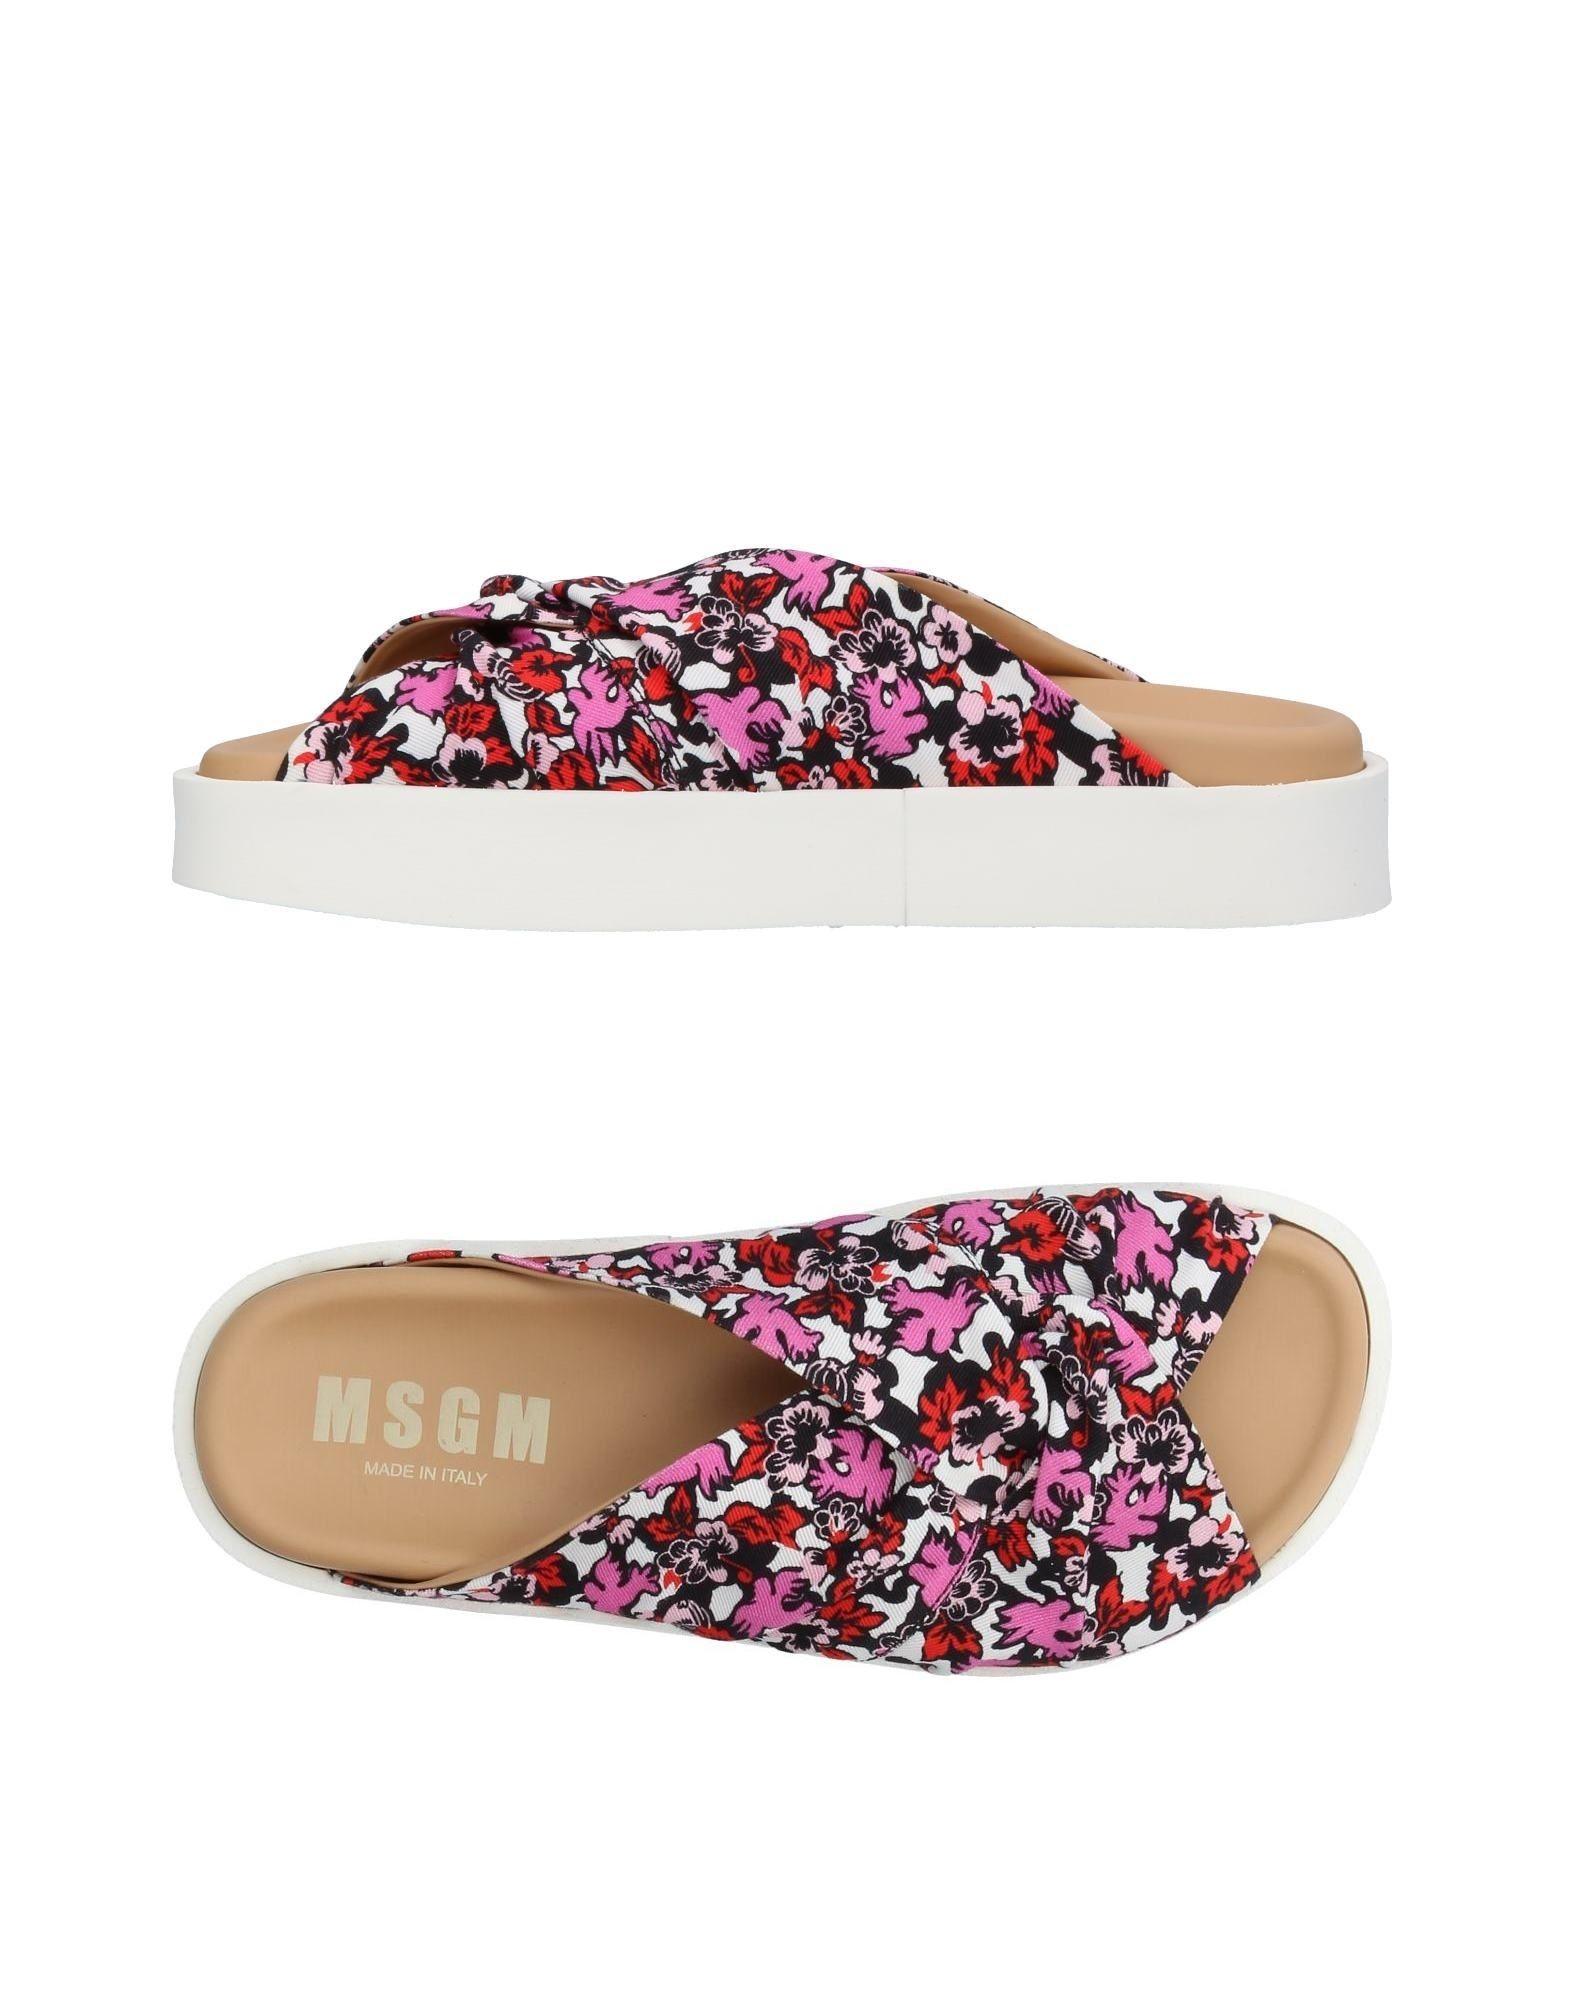 Msgm Sandalen Damen  11380733XB Gute Qualität beliebte Schuhe